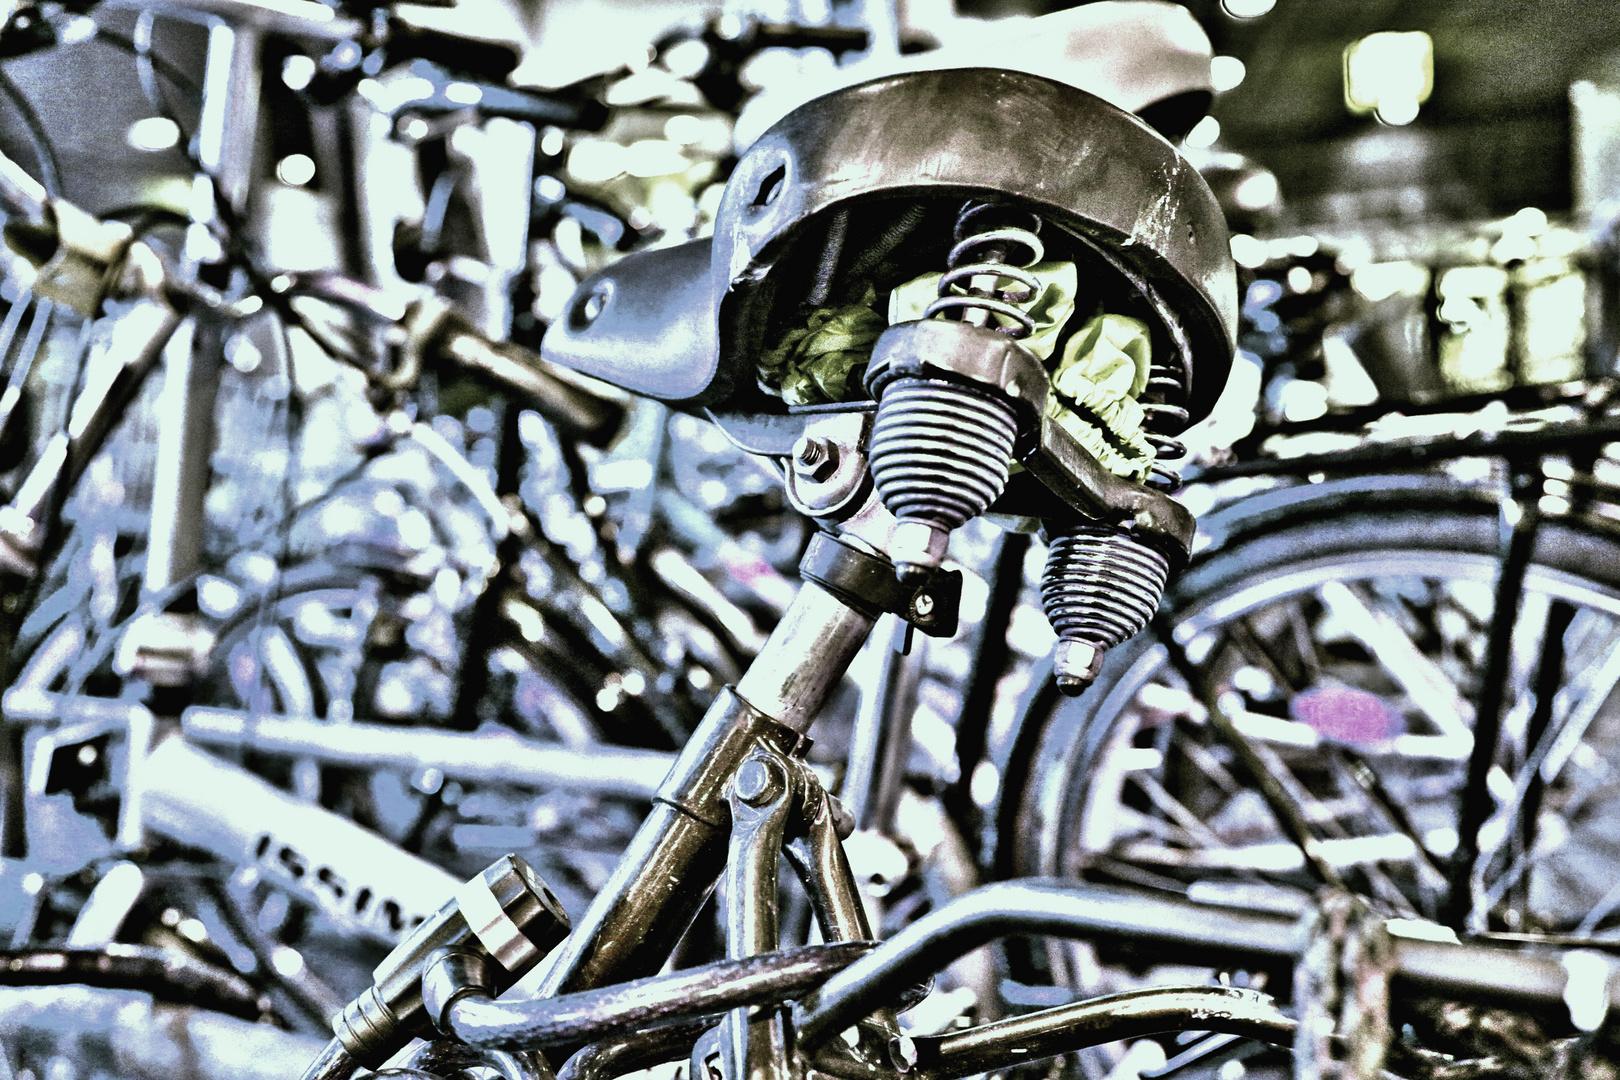 Fahrräder am Düsseldorfer HBF - Stahl